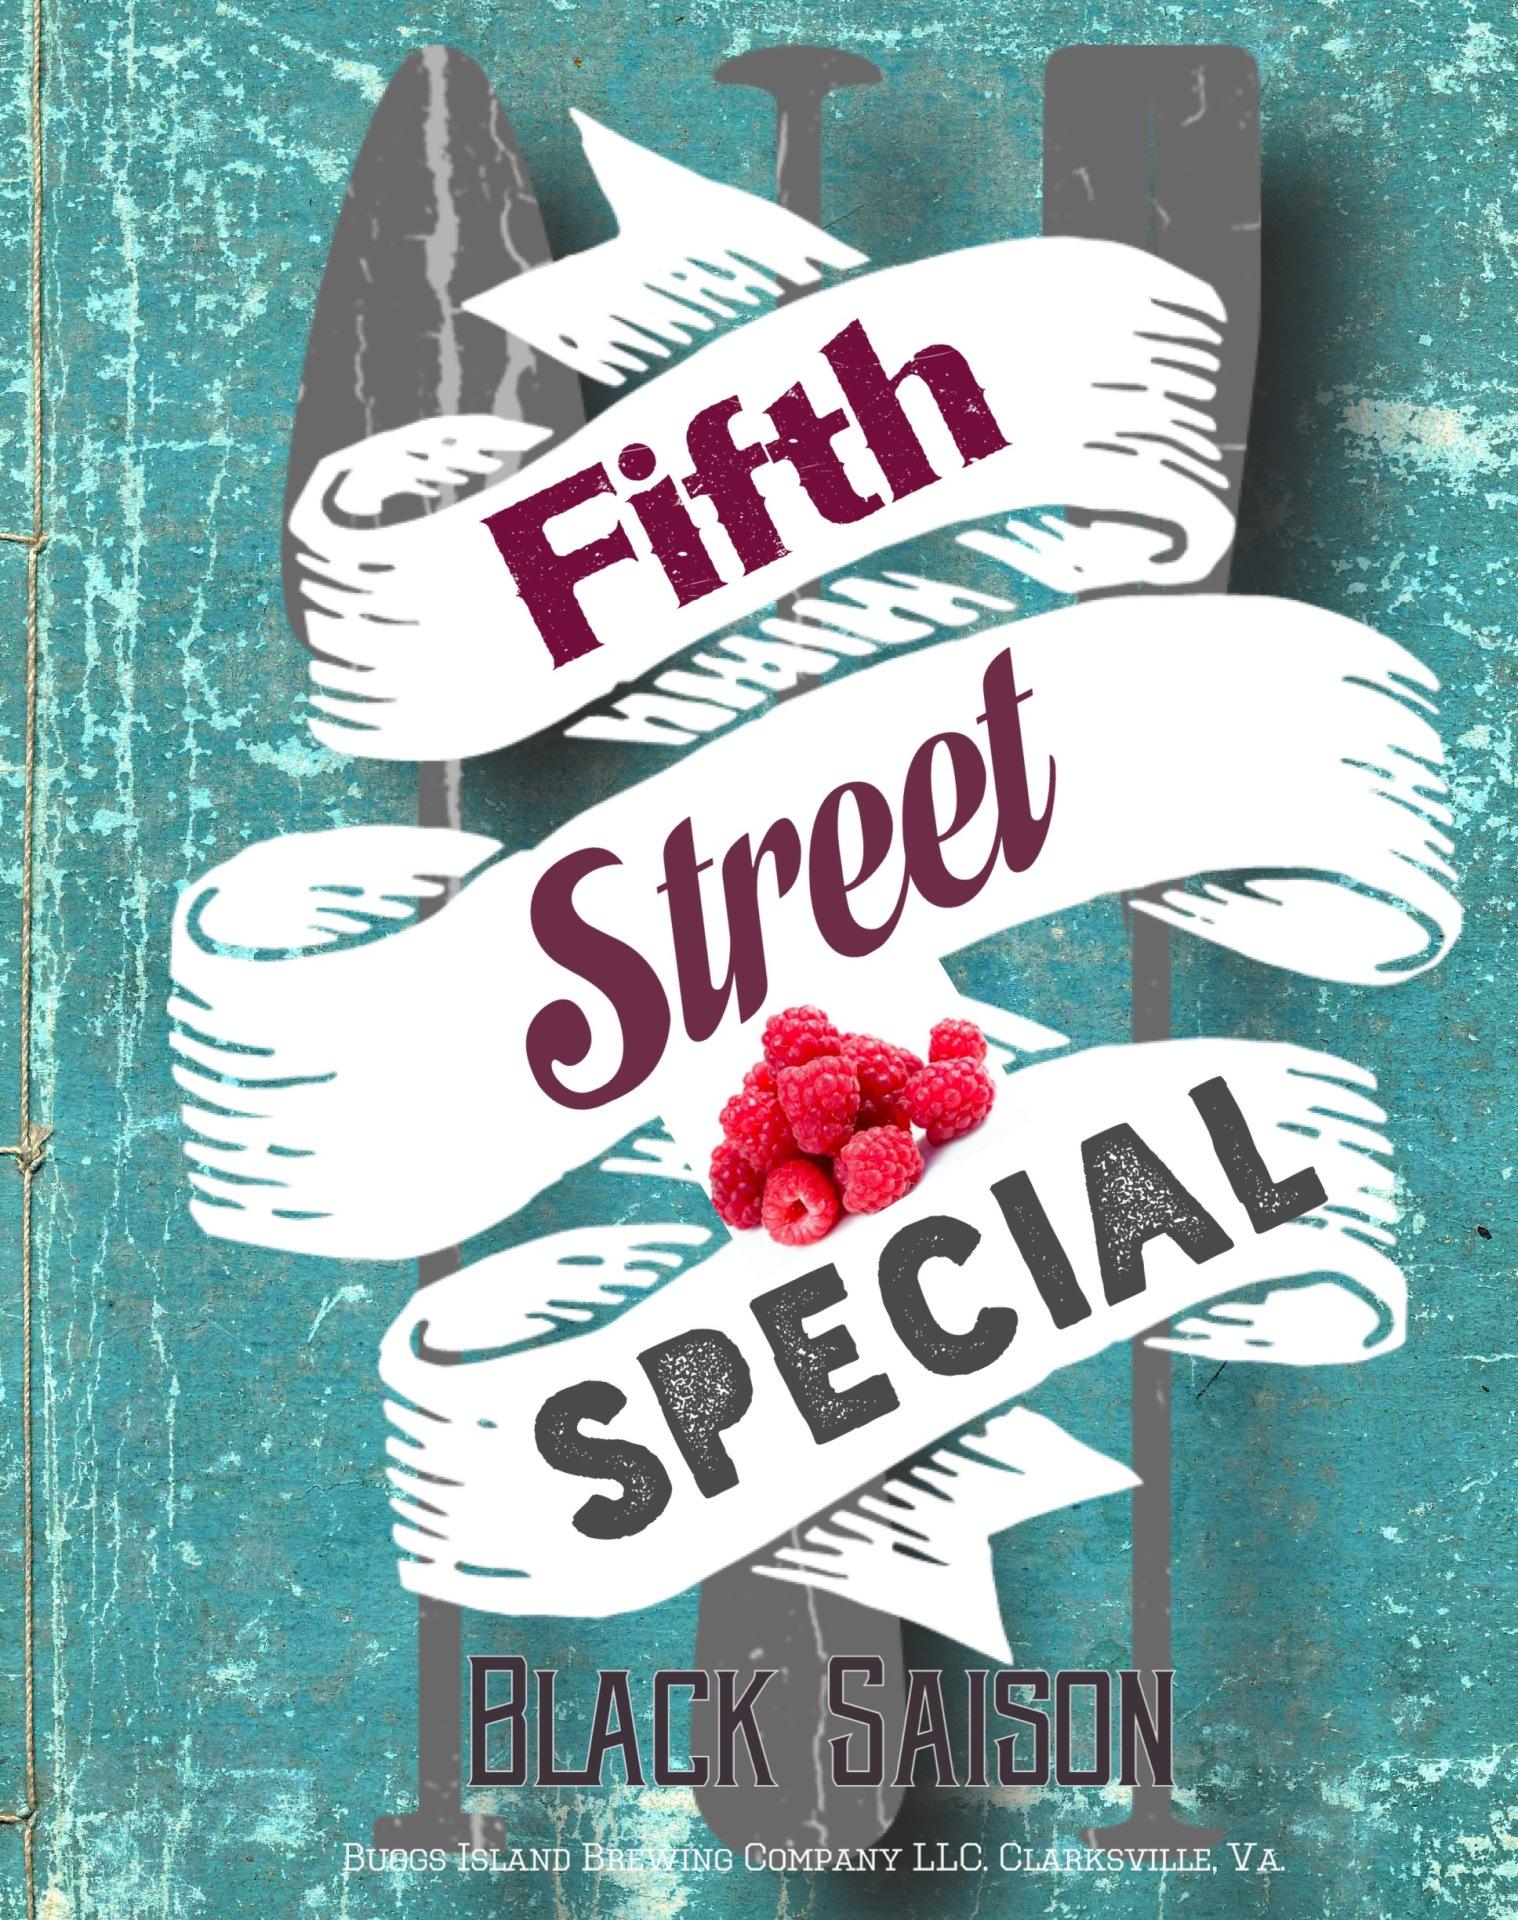 5th Street Special Black Saison